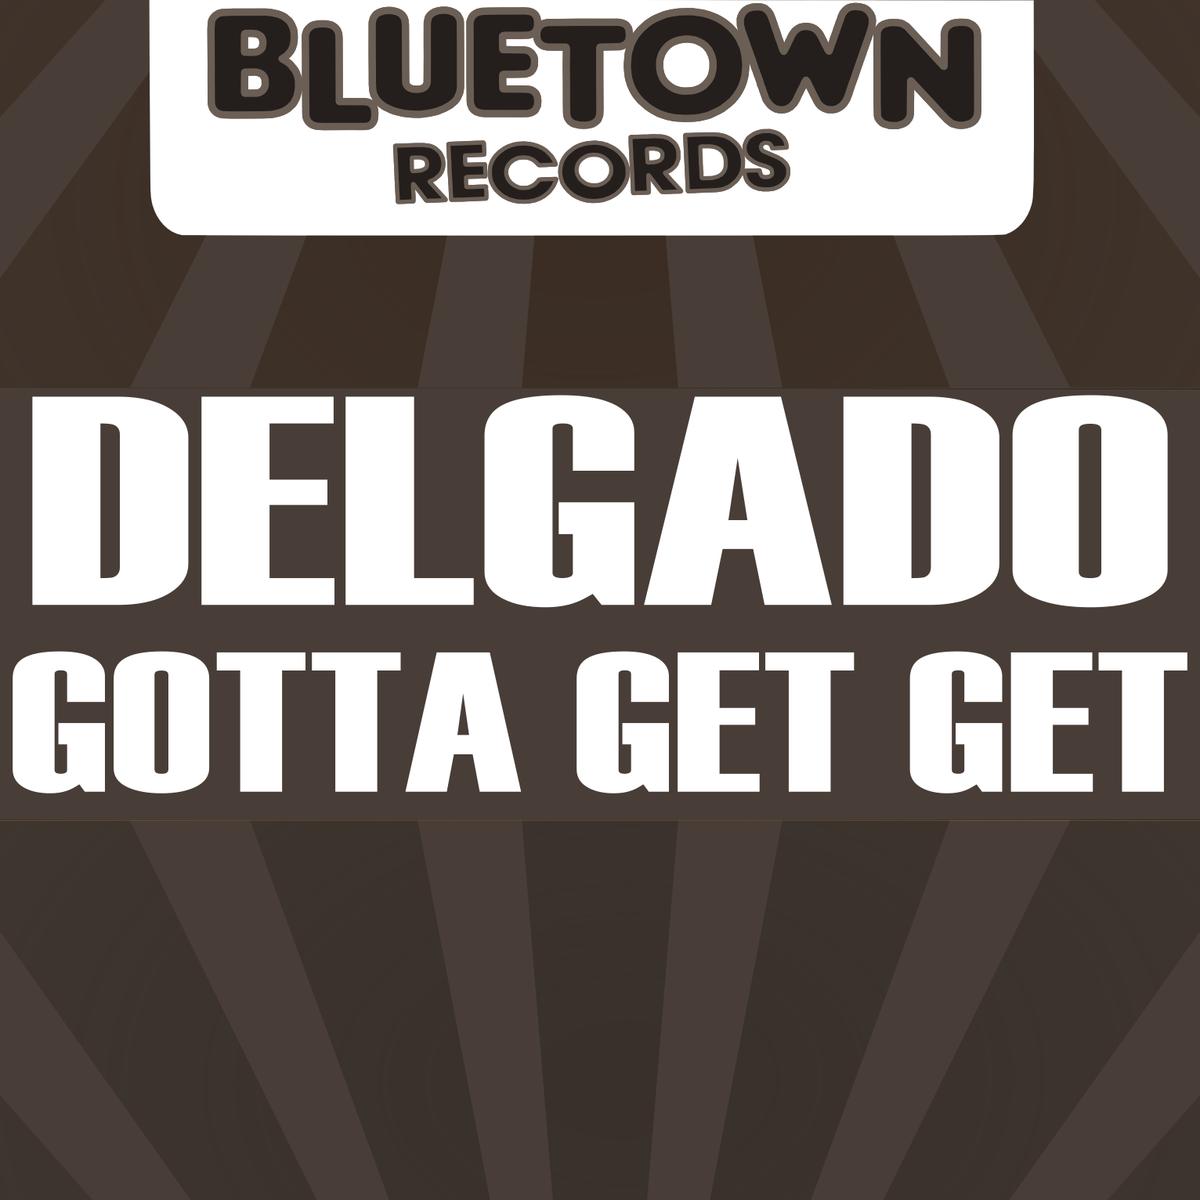 Out now! Delgado &quot;Gotta Get Get&quot;  http://www. traxsource.com/title/698720/g otta-get-get &nbsp; …  #housemusic #realhousemusic #jackinhouse #traxsource<br>http://pic.twitter.com/pLyfhkFSIS